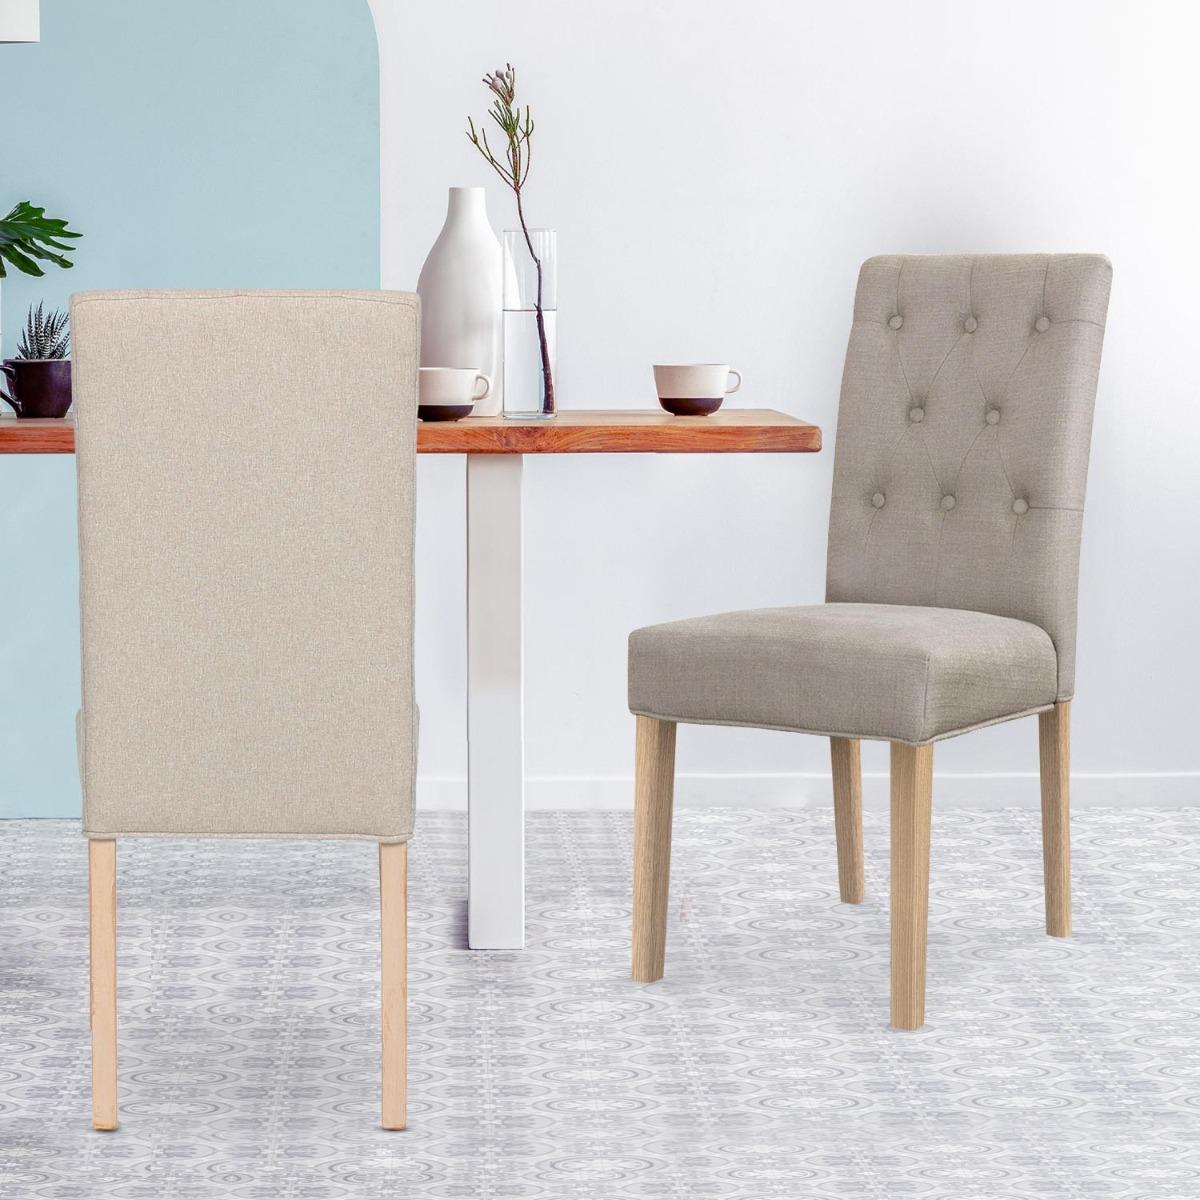 Set di 2 sedie Costel in tessuto beige